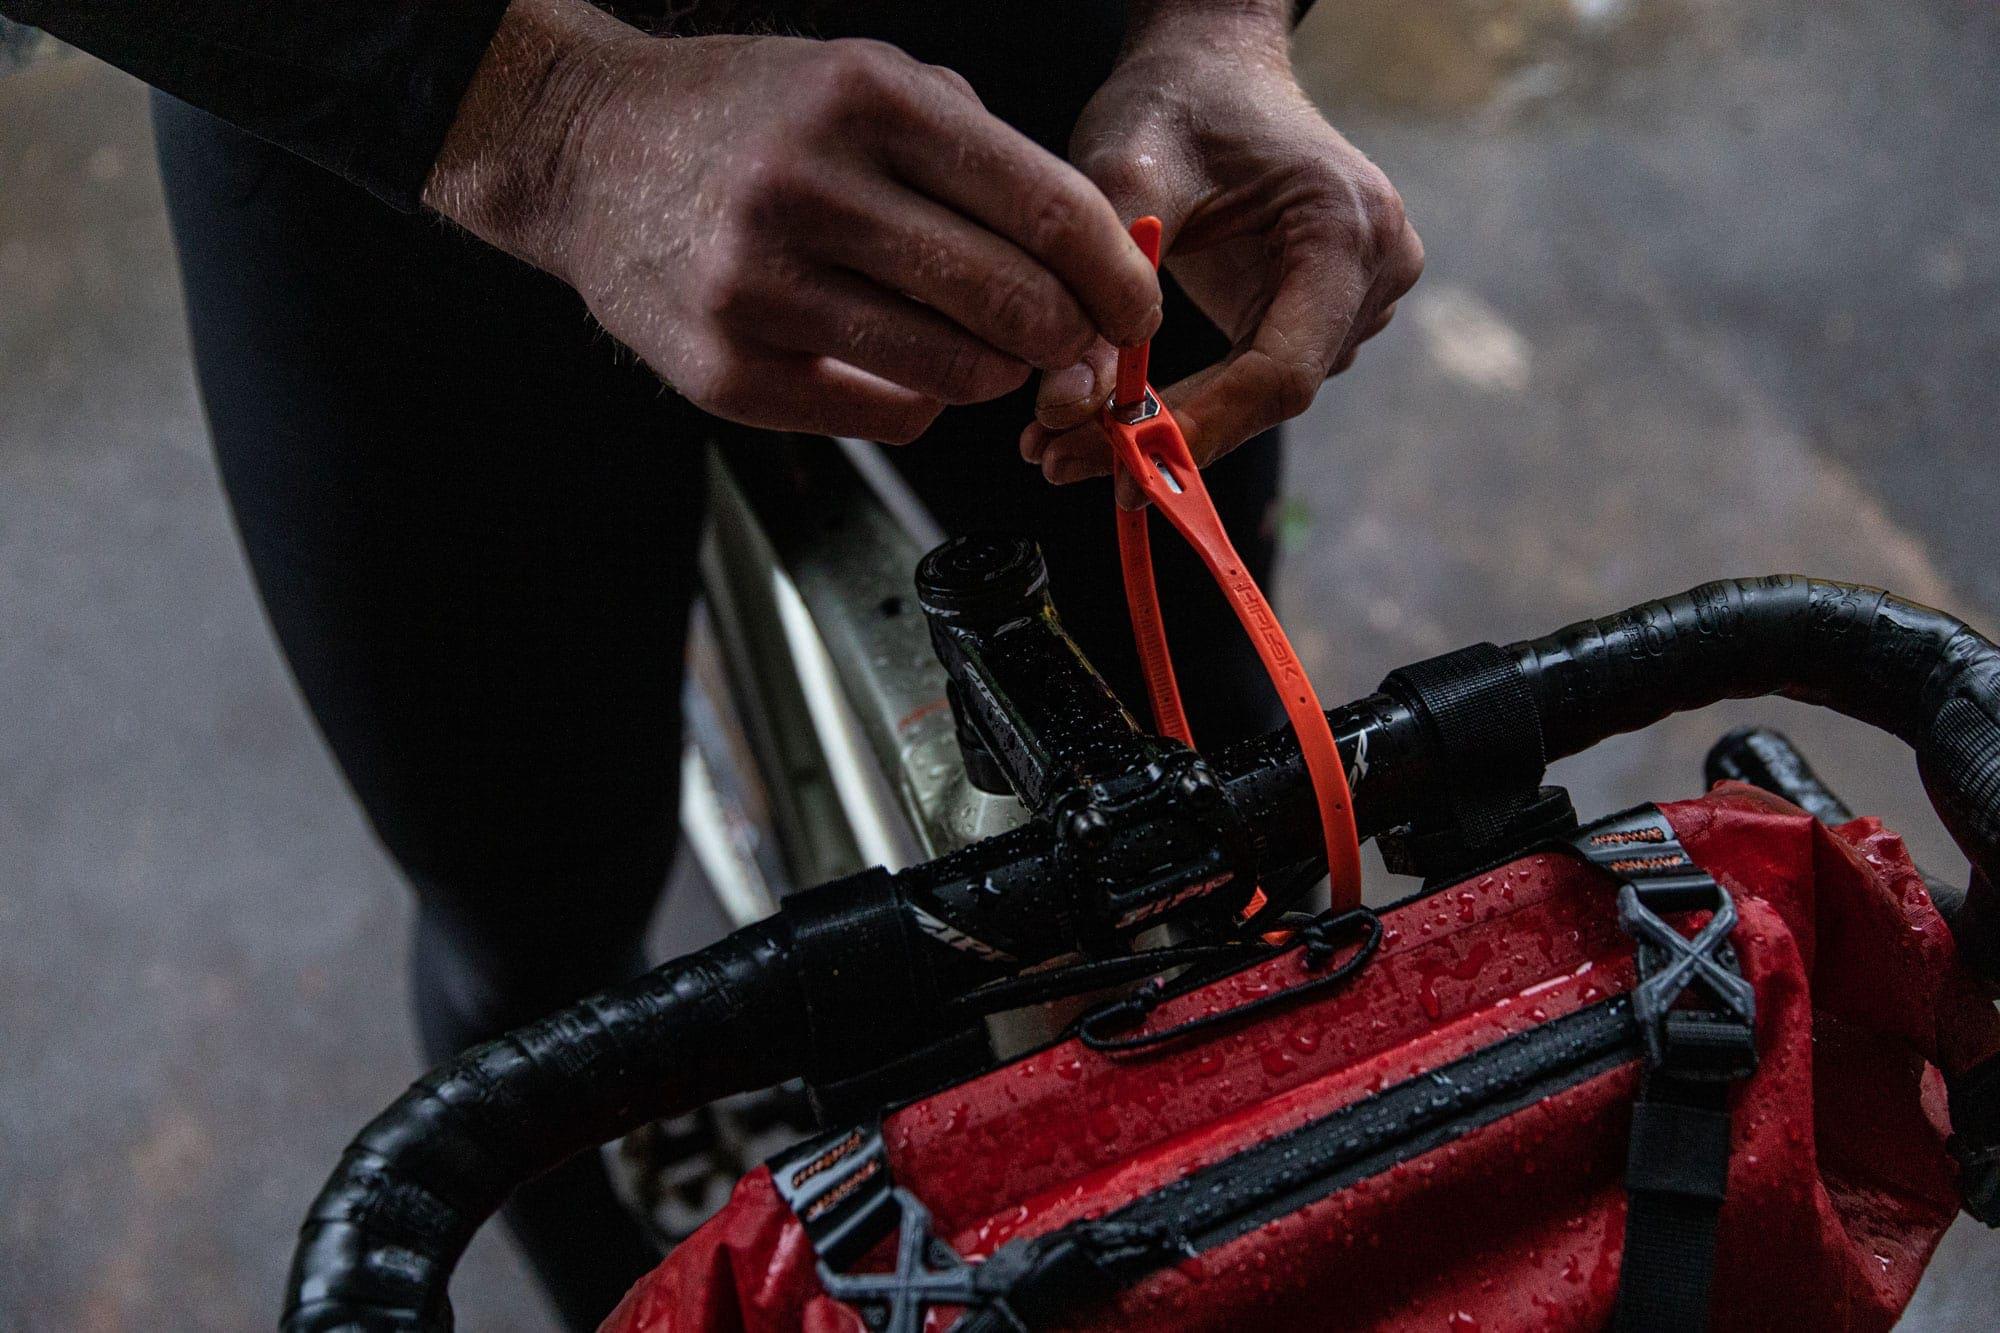 Z LOK bikepacking